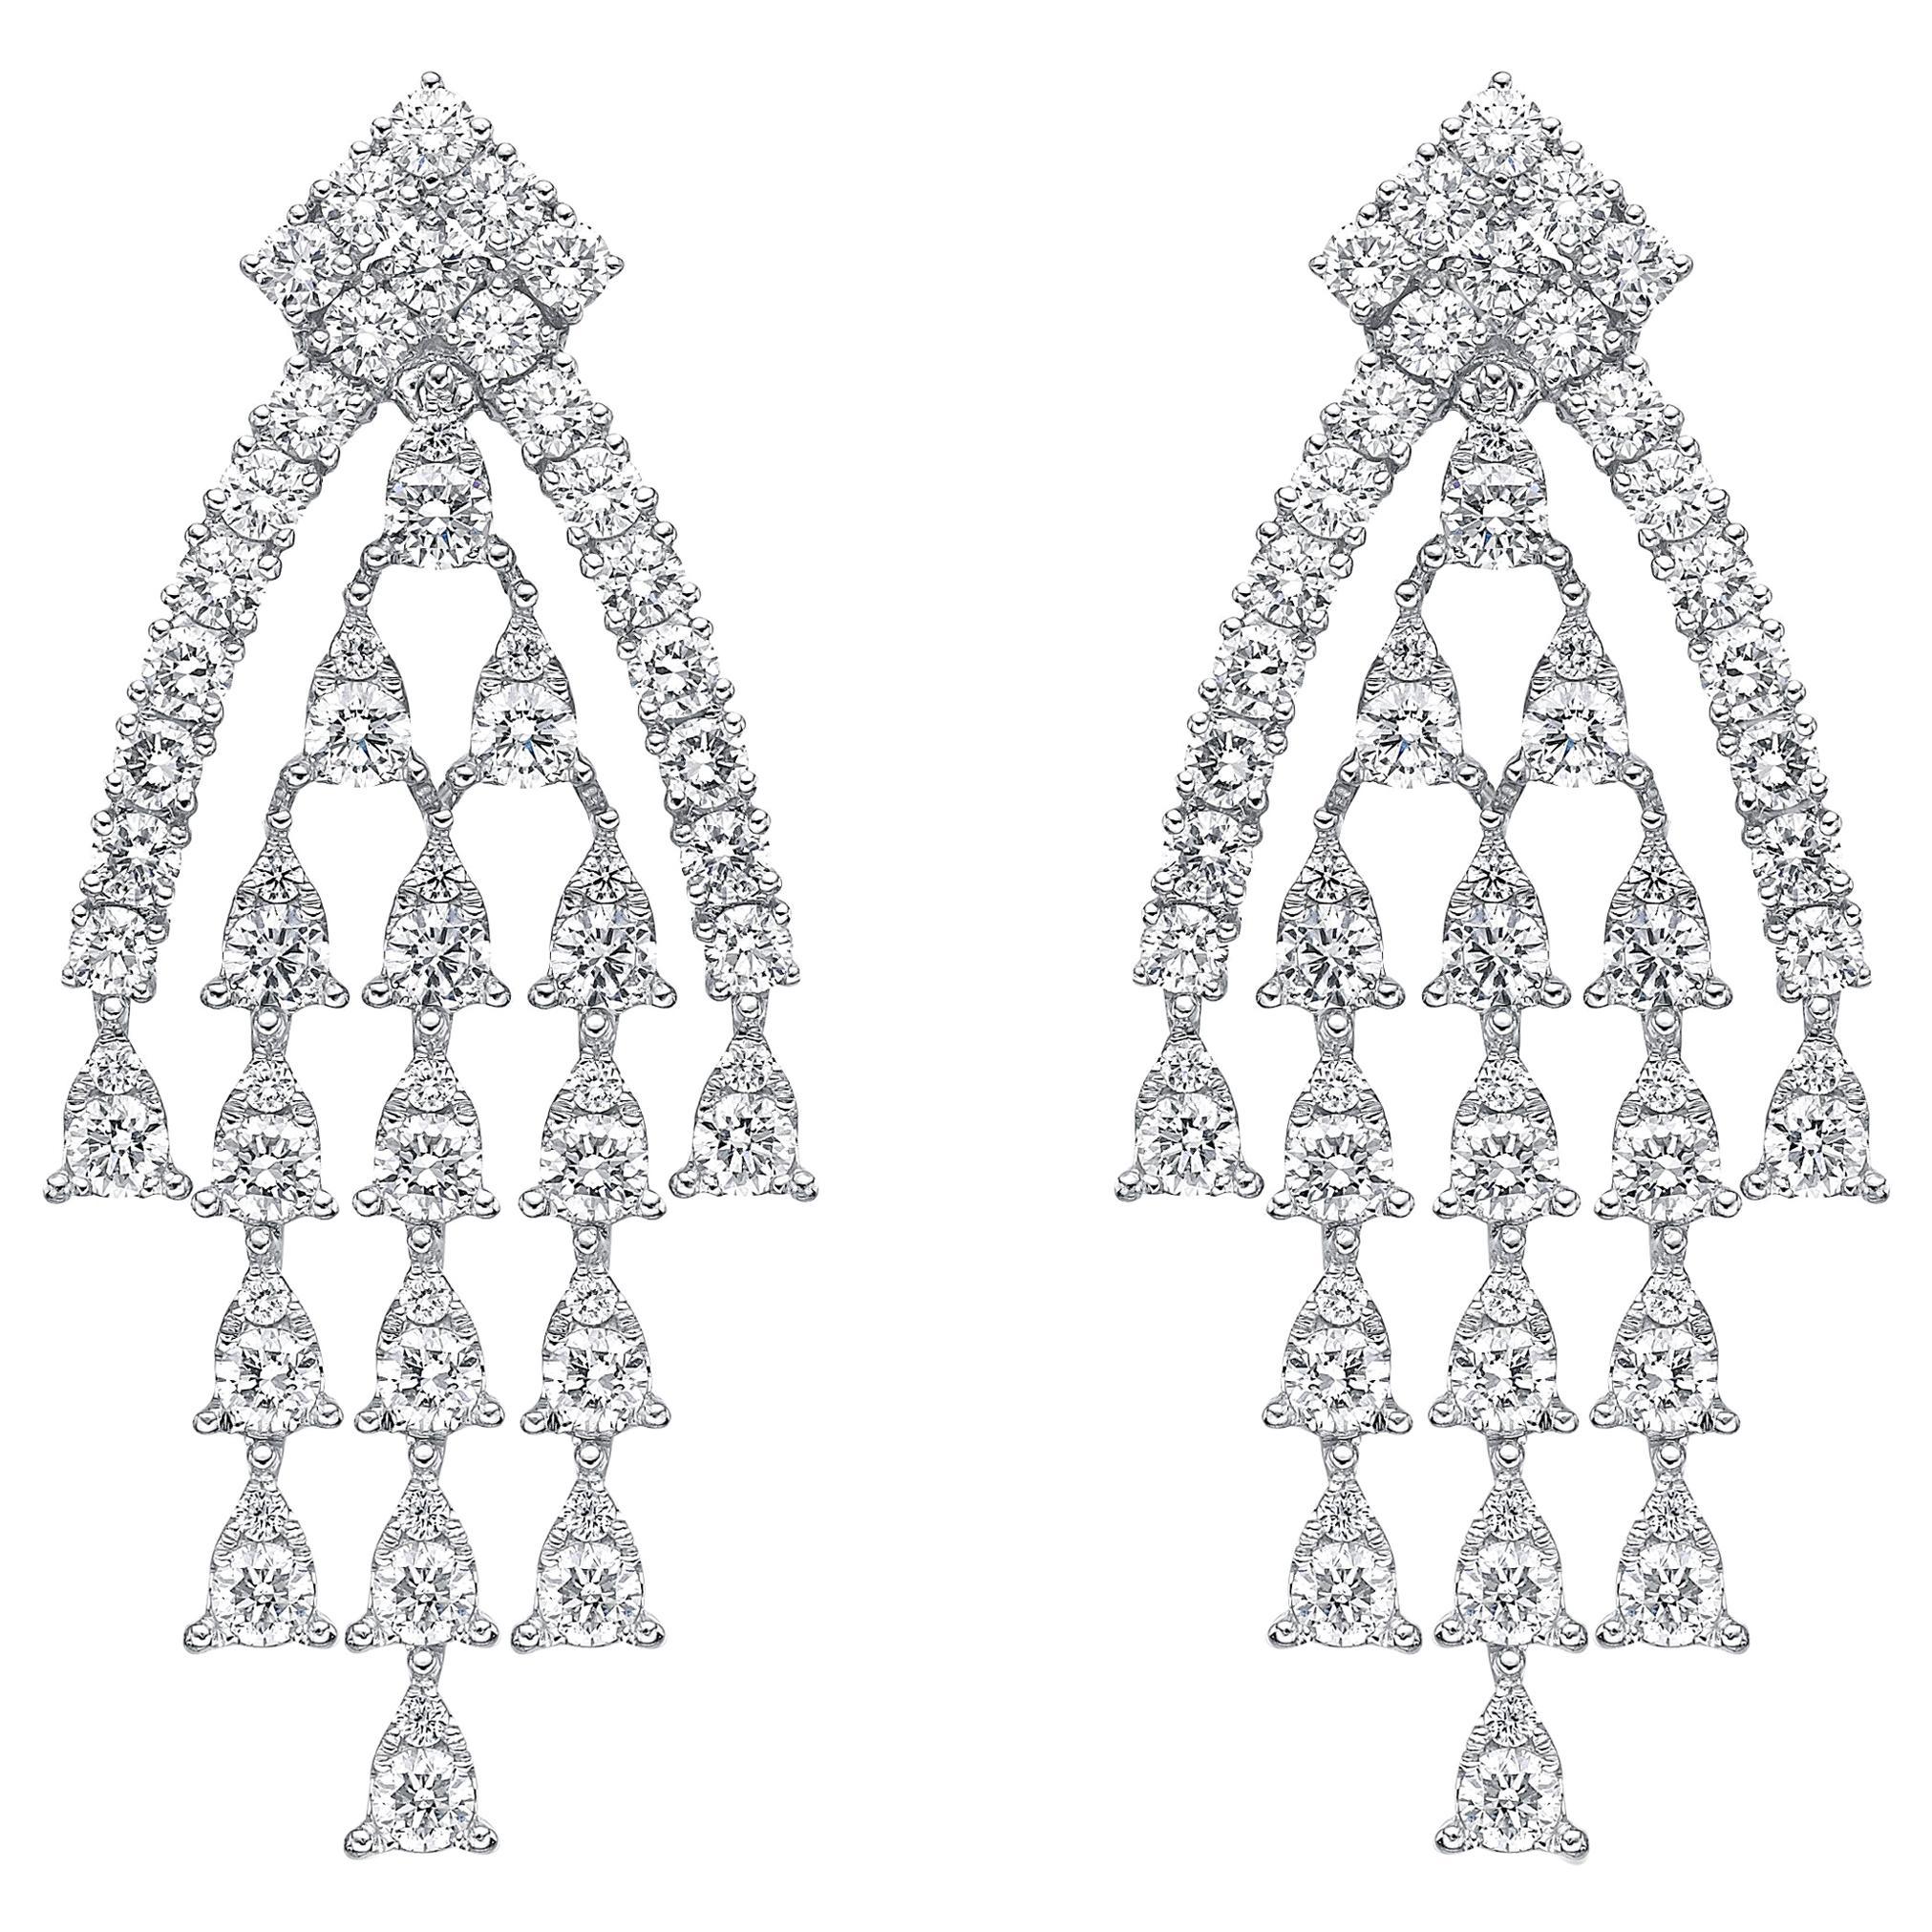 18 Karat Gold, 3.99 Carat, F Color, VS Clarity, Diamond Paved Earrings